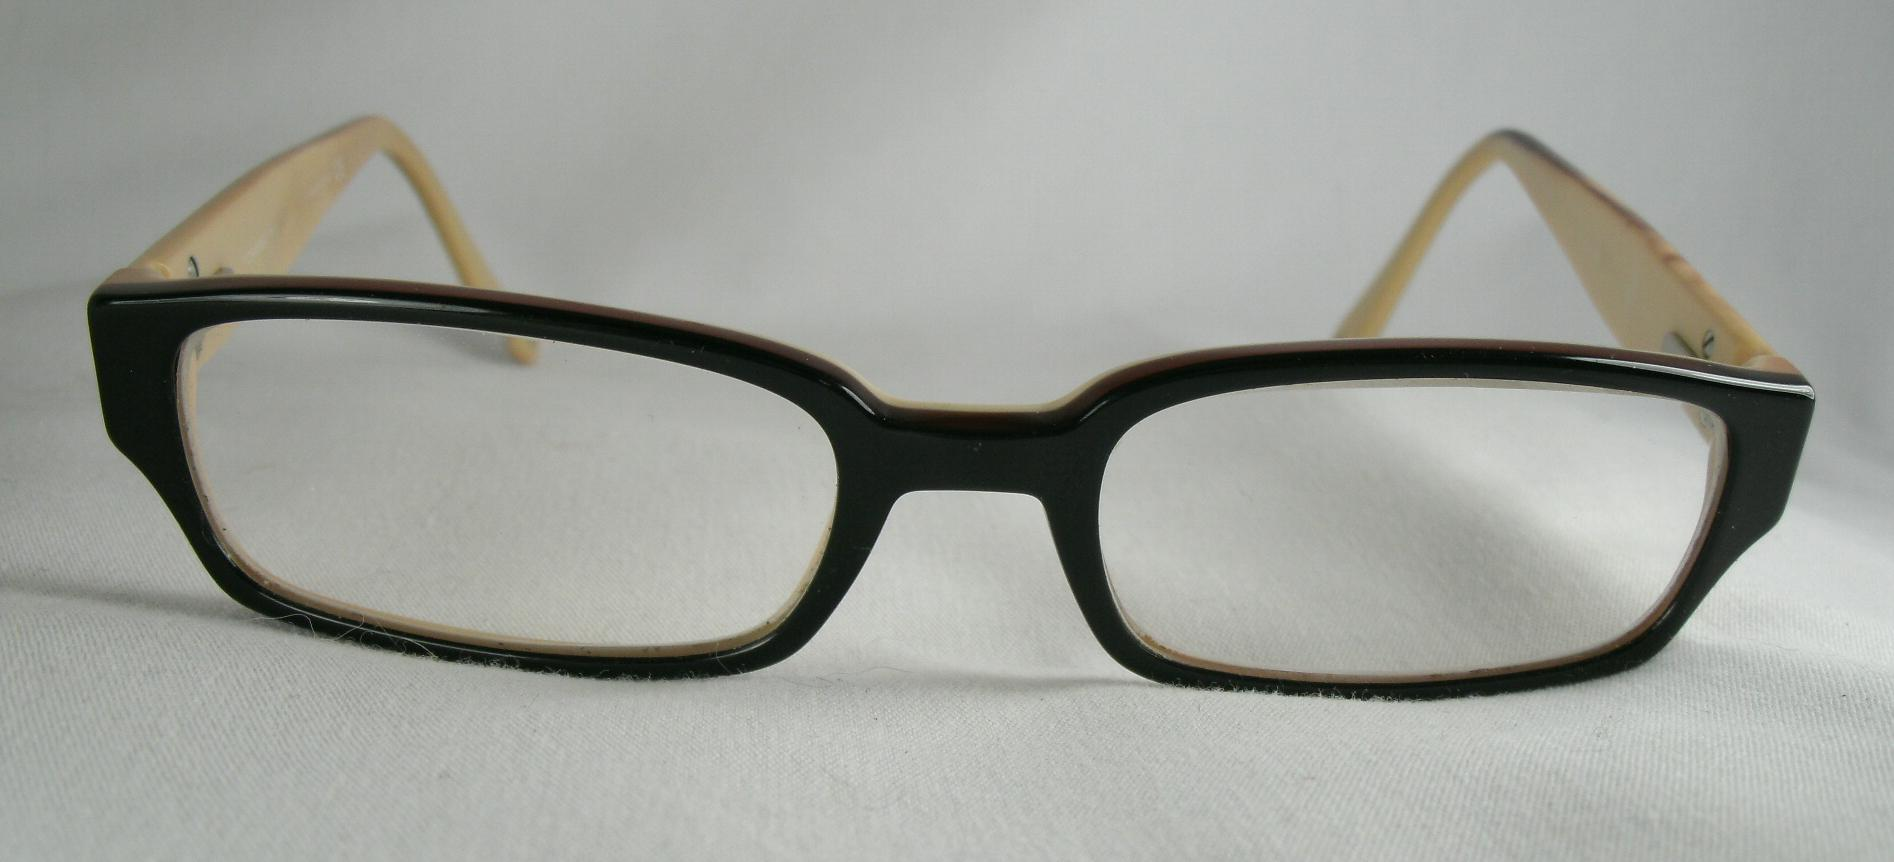 39828c291630 Chanel Designer Eyeglass Frames 3075b Glasses Italy Ebay